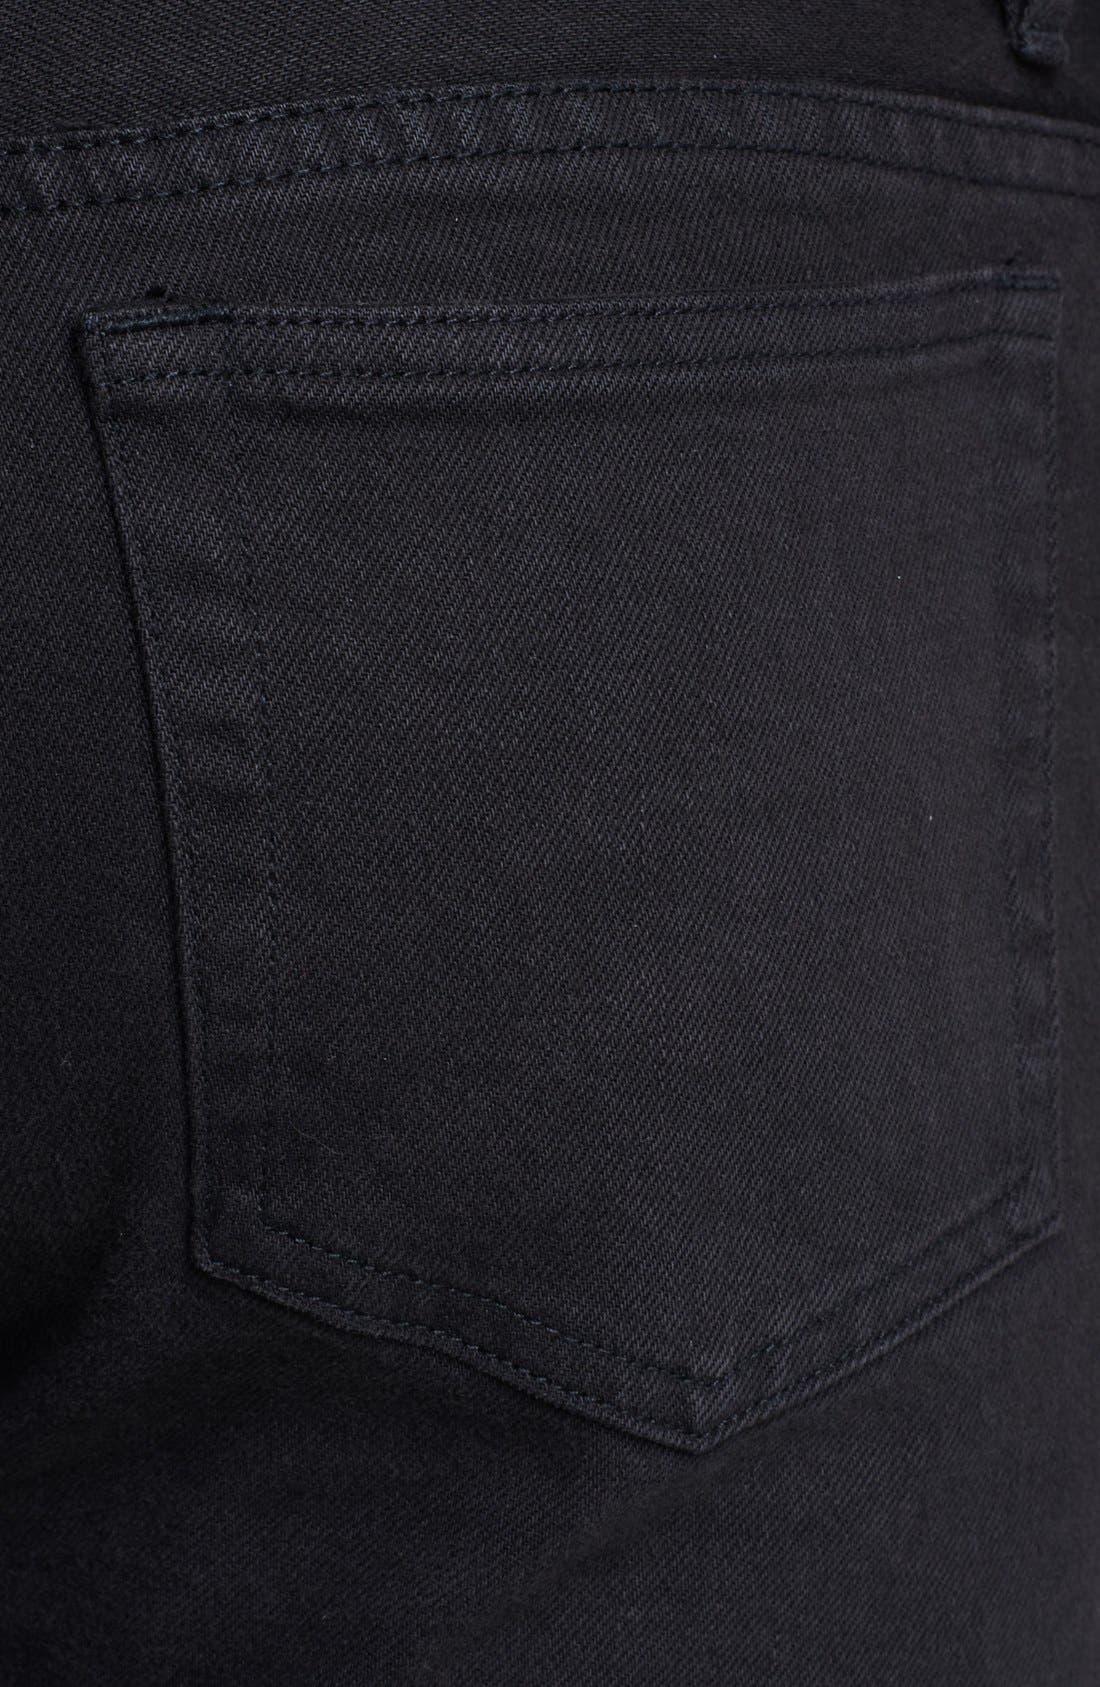 'Petit Standard' Skinny Fit Jeans,                             Alternate thumbnail 4, color,